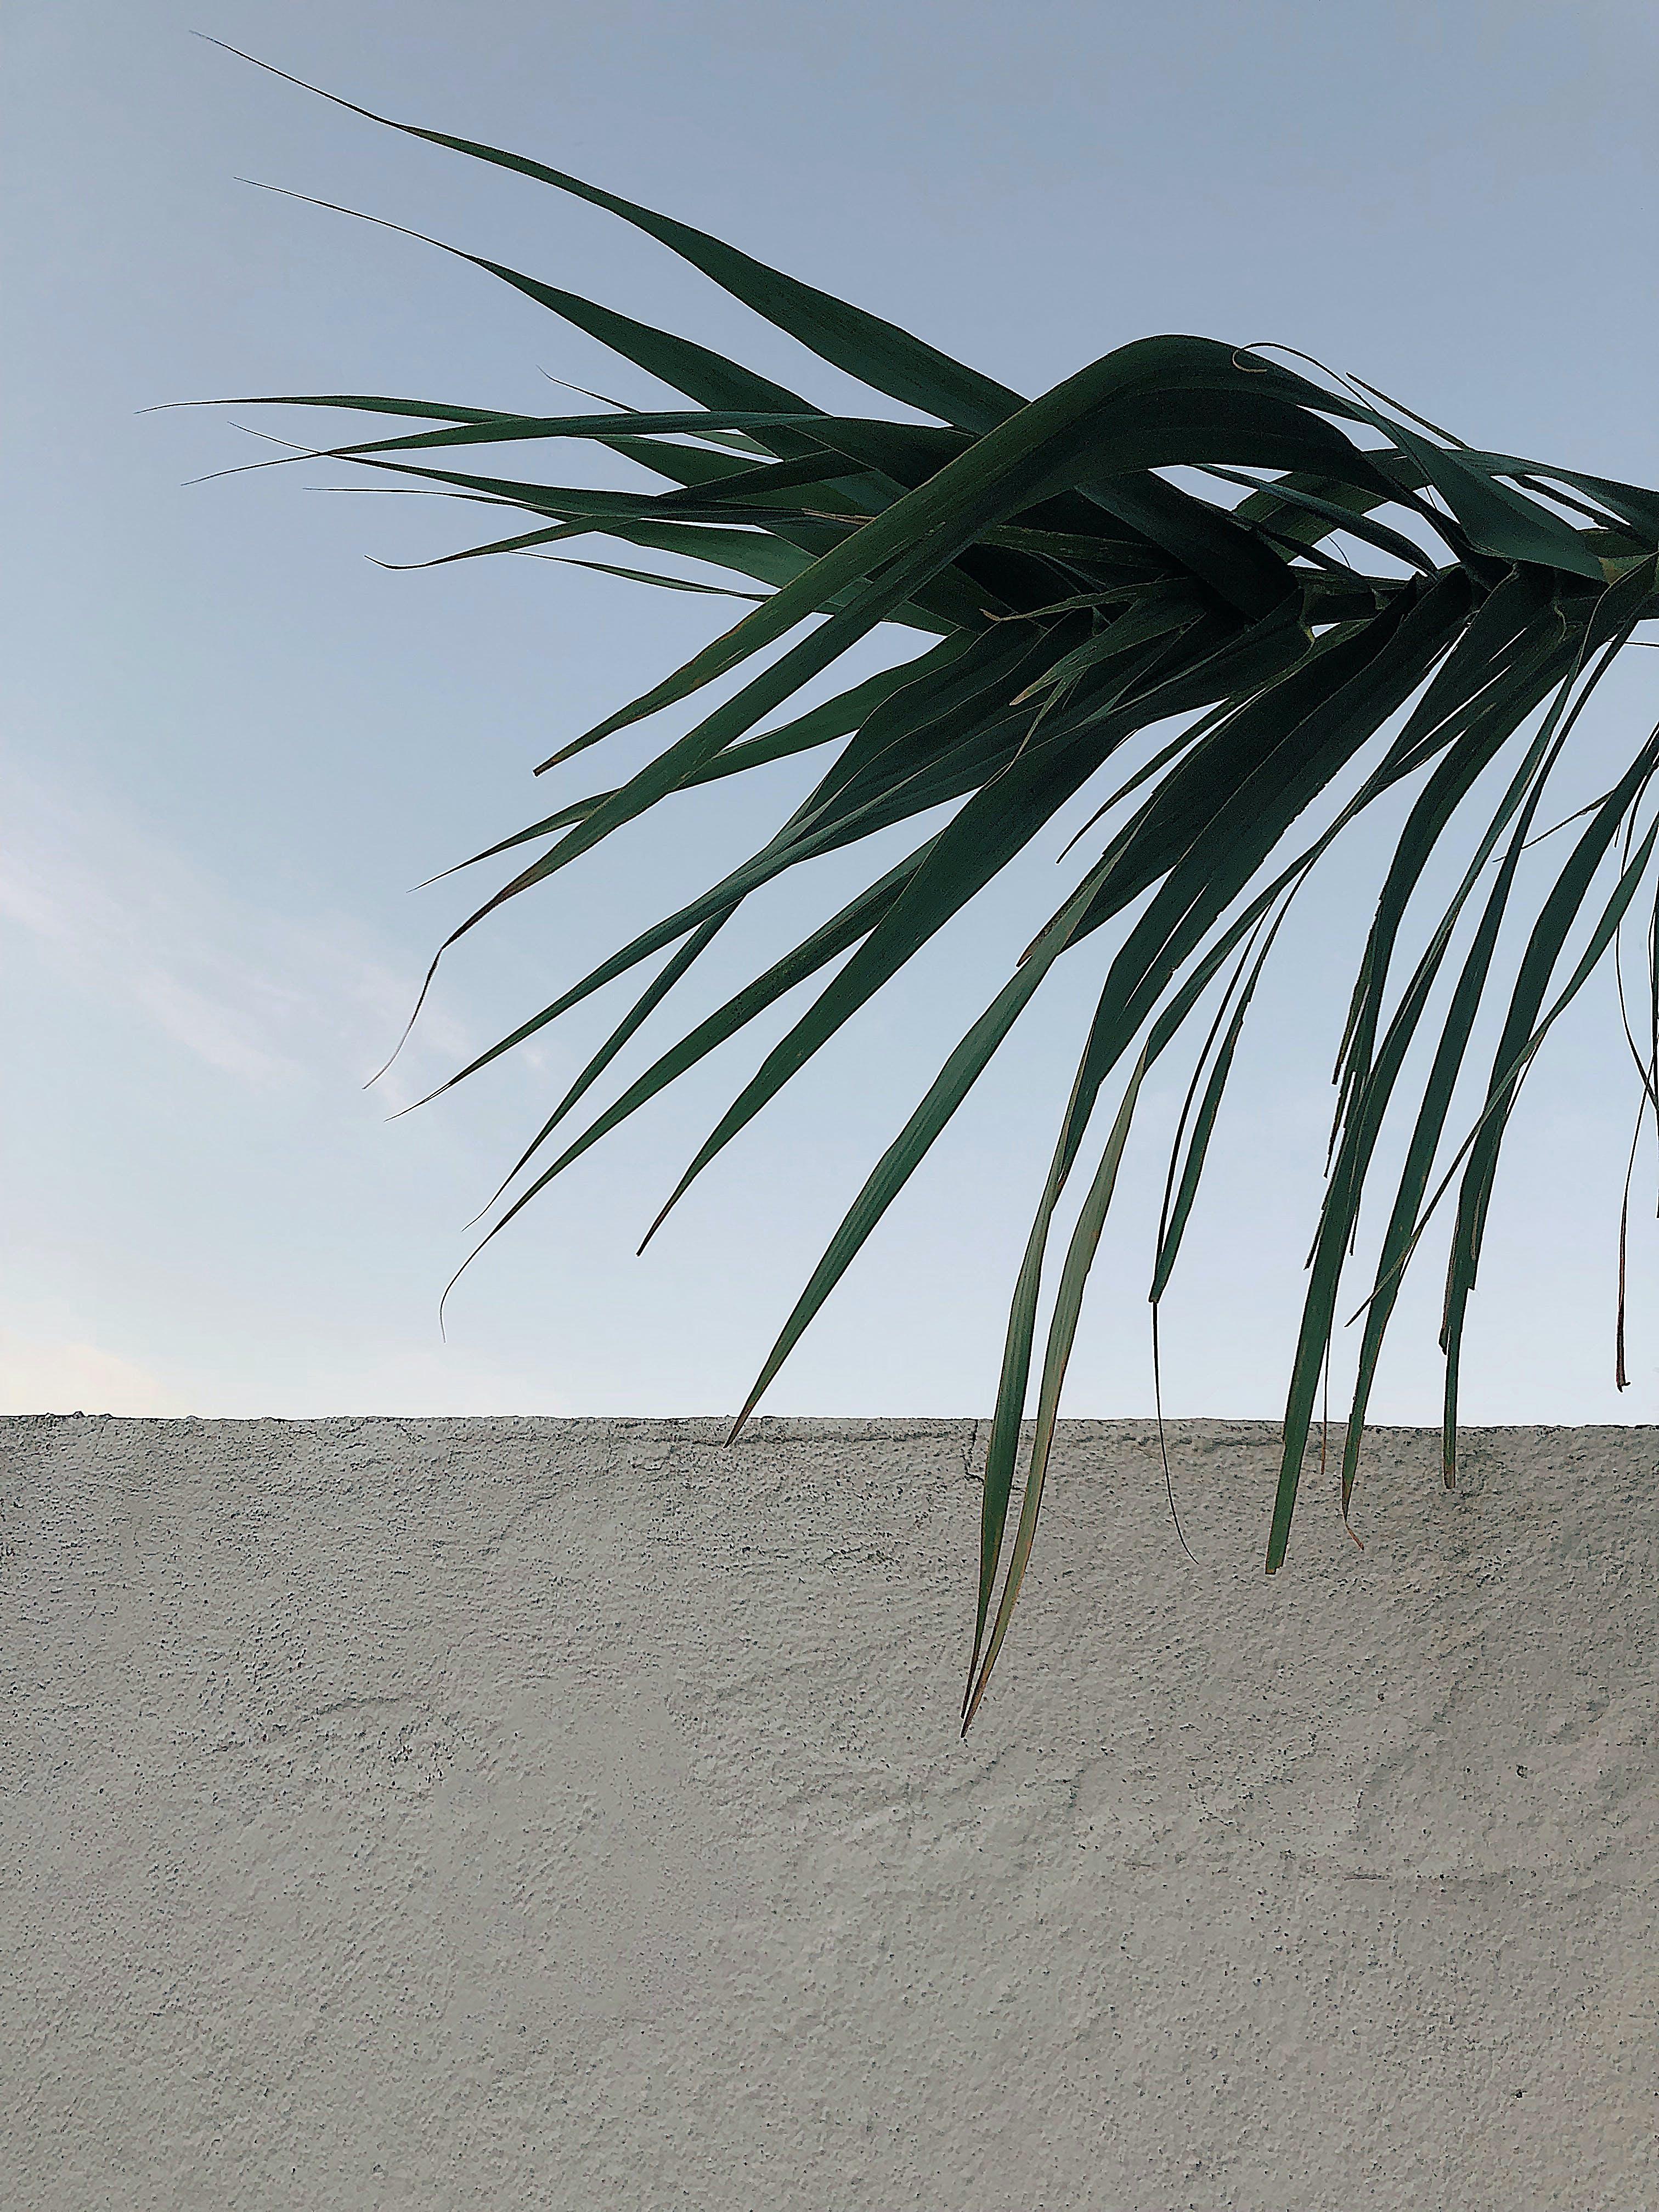 Green Palm Leaf over White Concrete